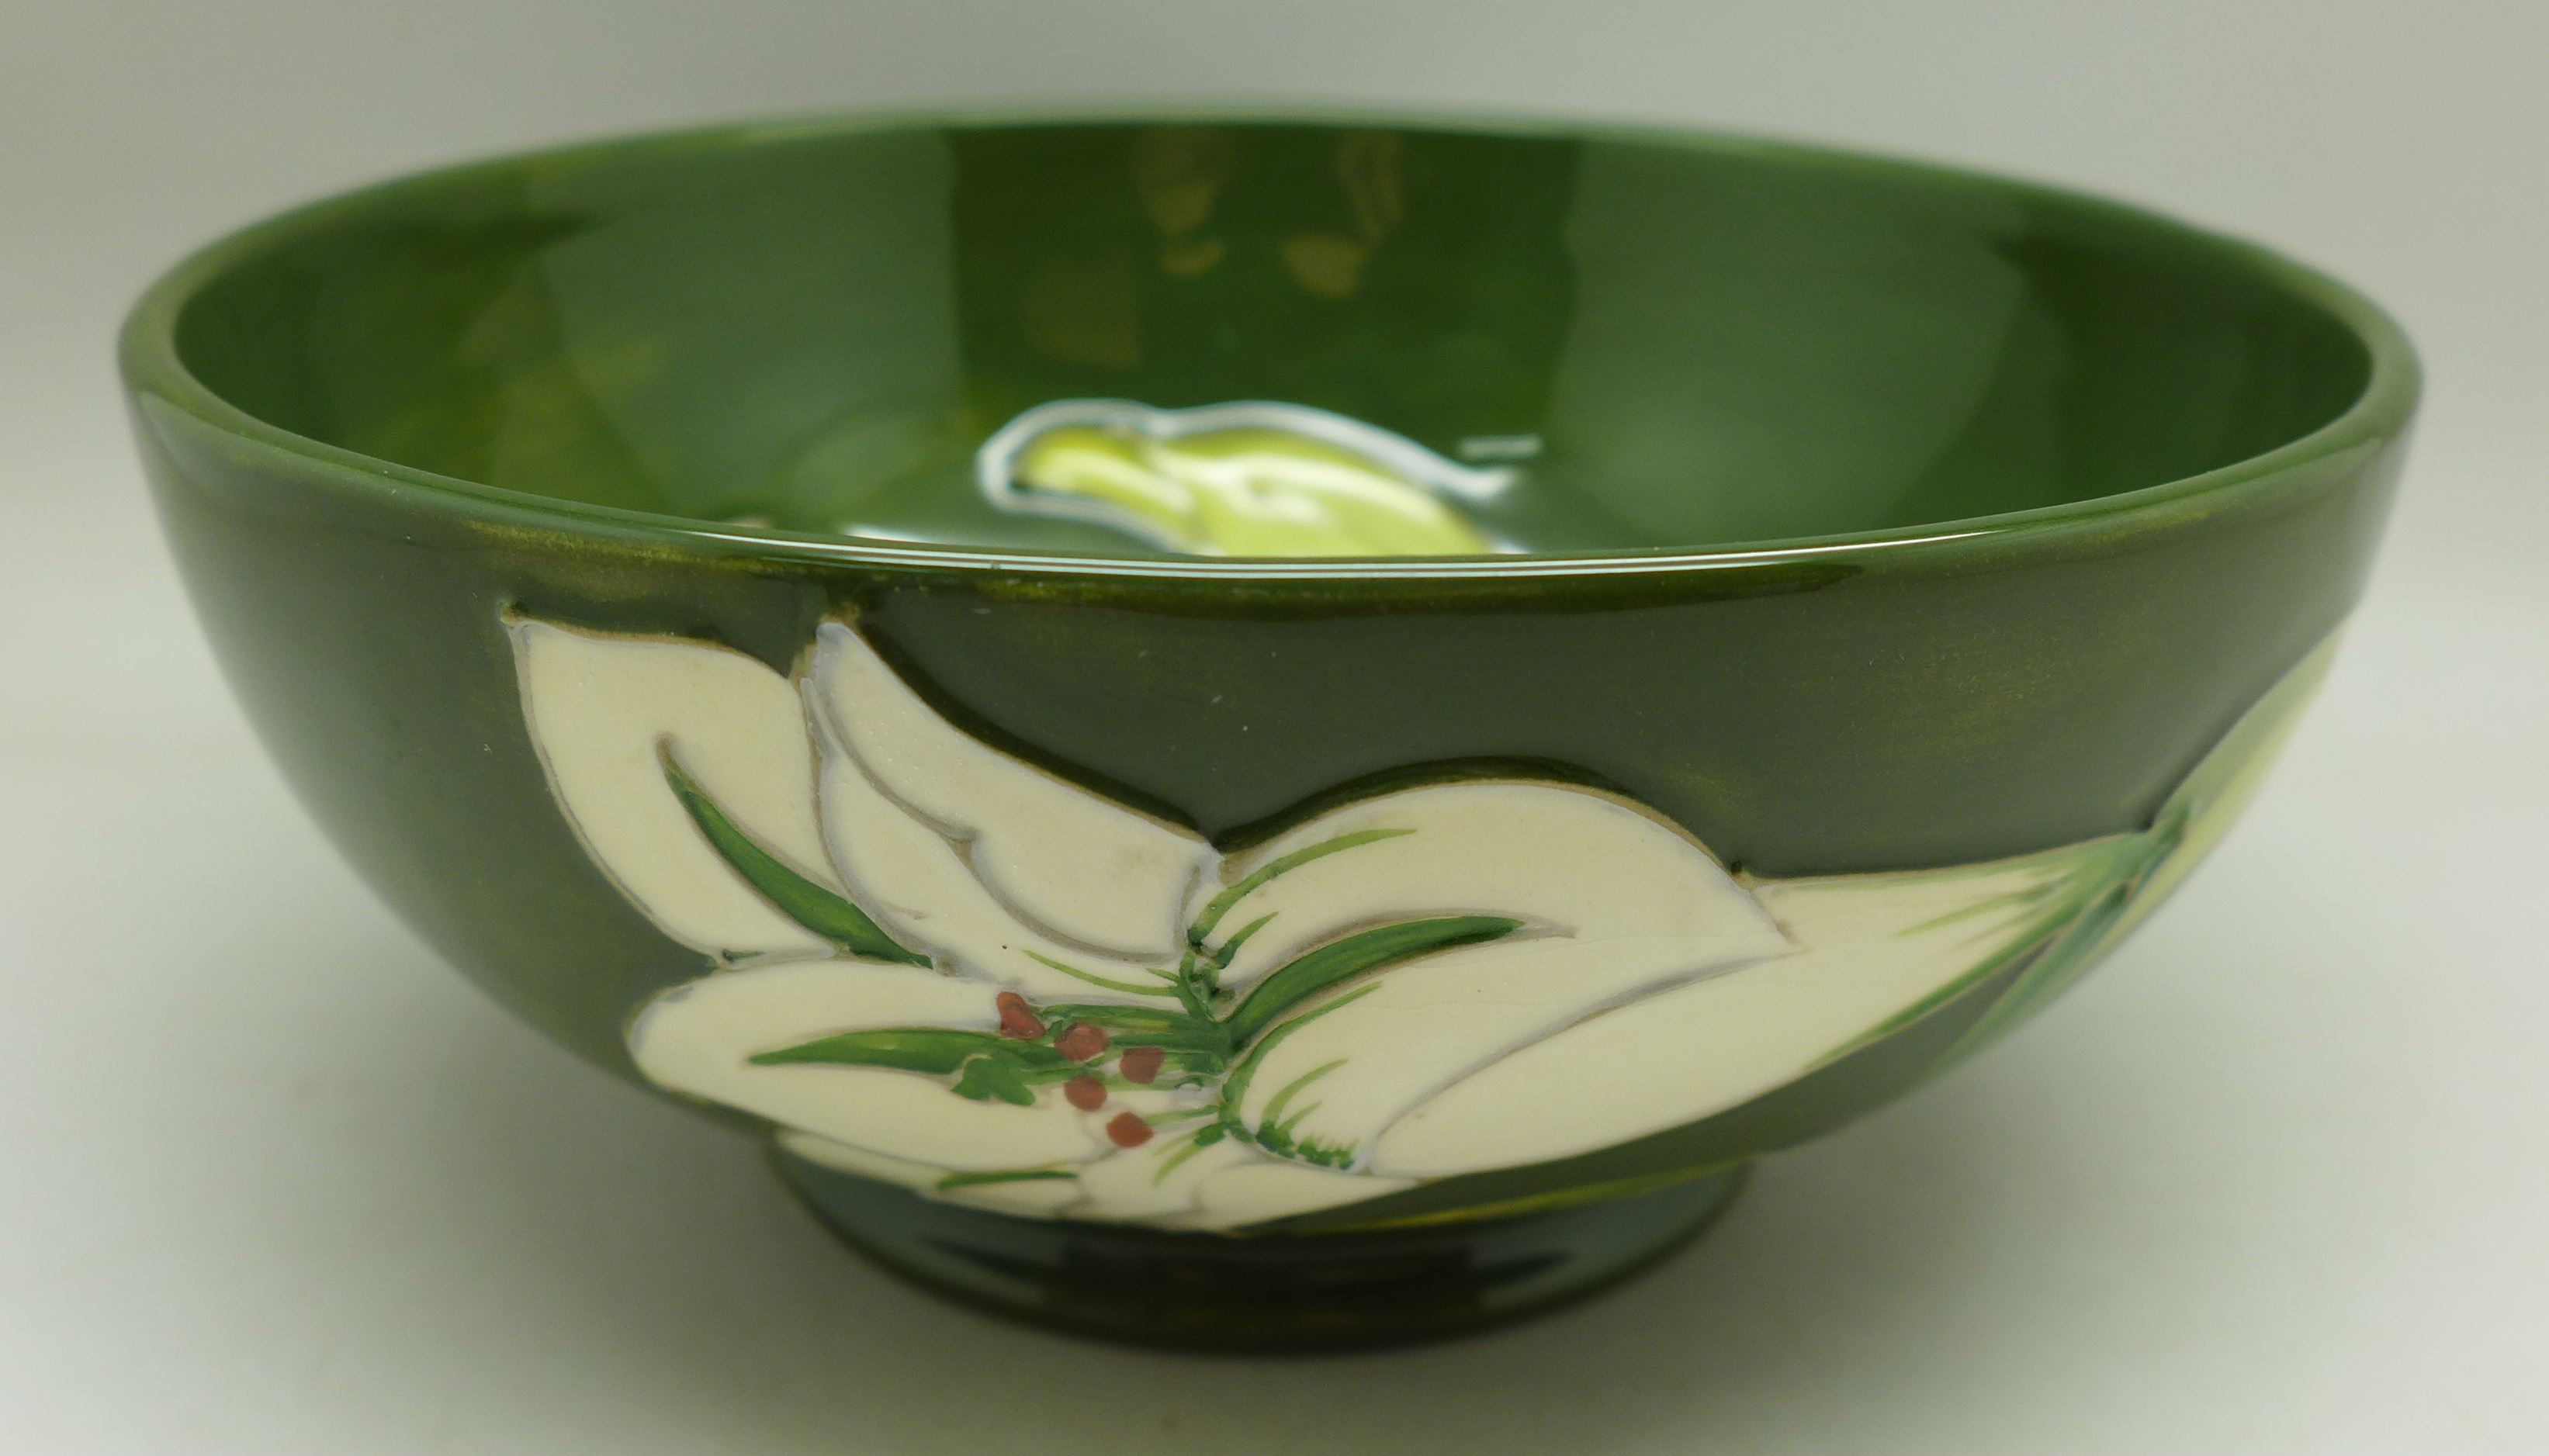 A Moorcroft Bermuda Lily bowl, 163mm diameter